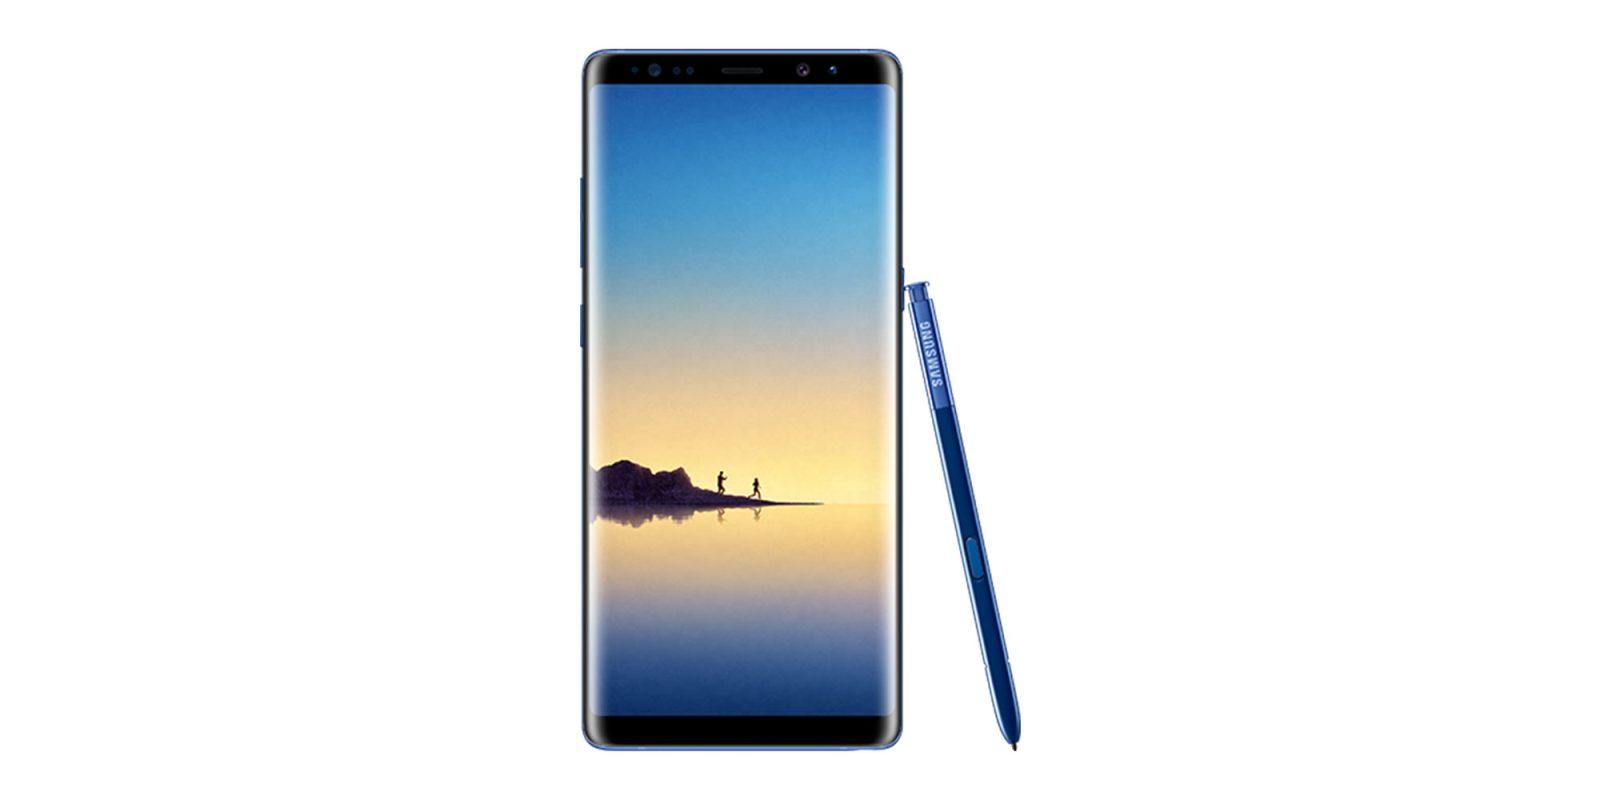 Galaxy Note 8: Samsung leaks handset on its website